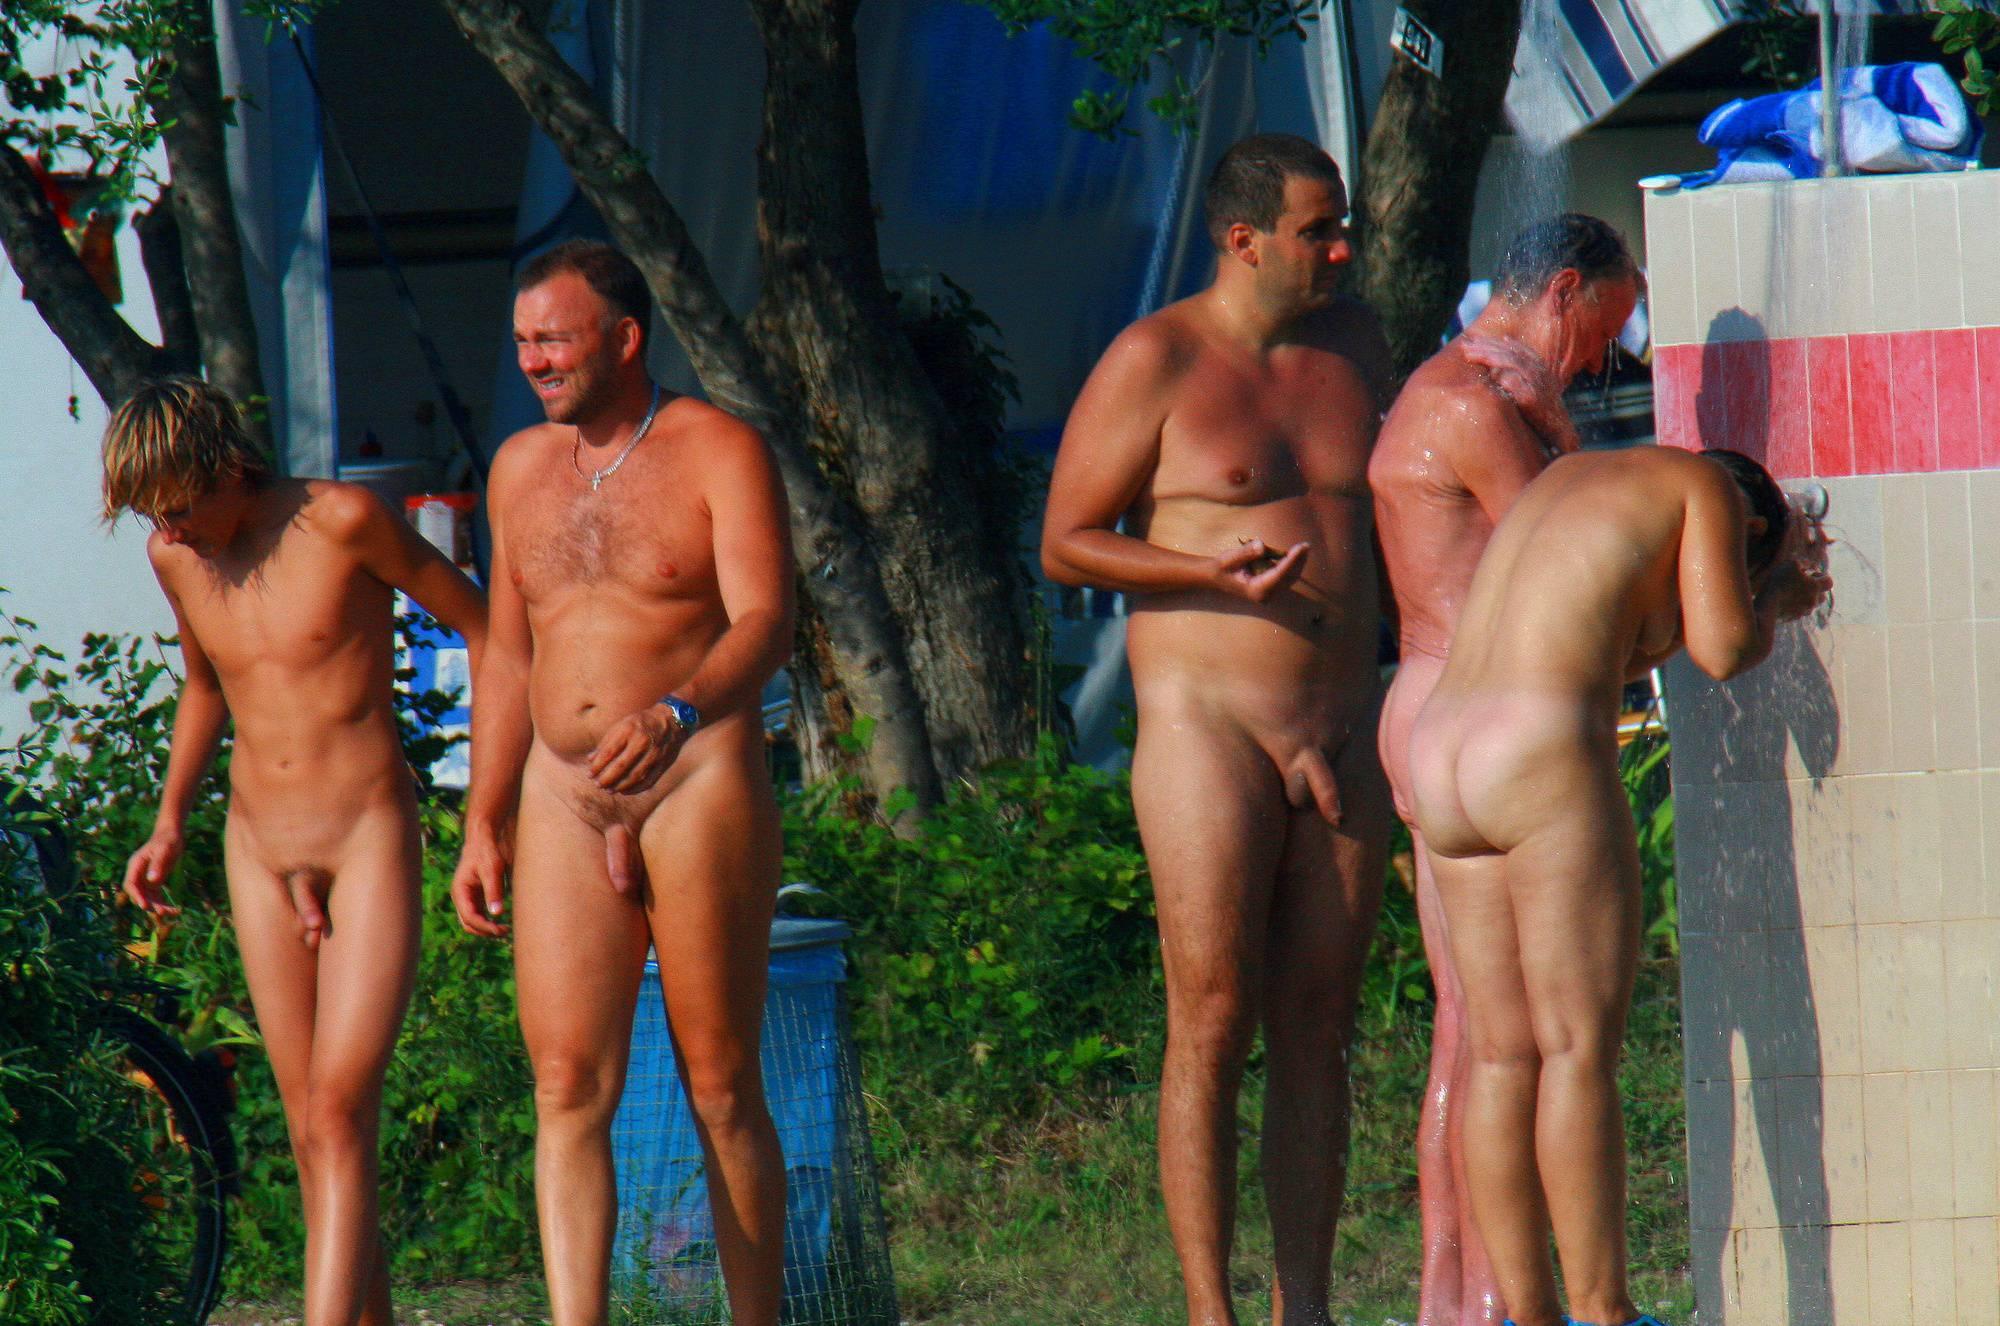 Nudist Gallery Ula FKK Family Shower Site - 1